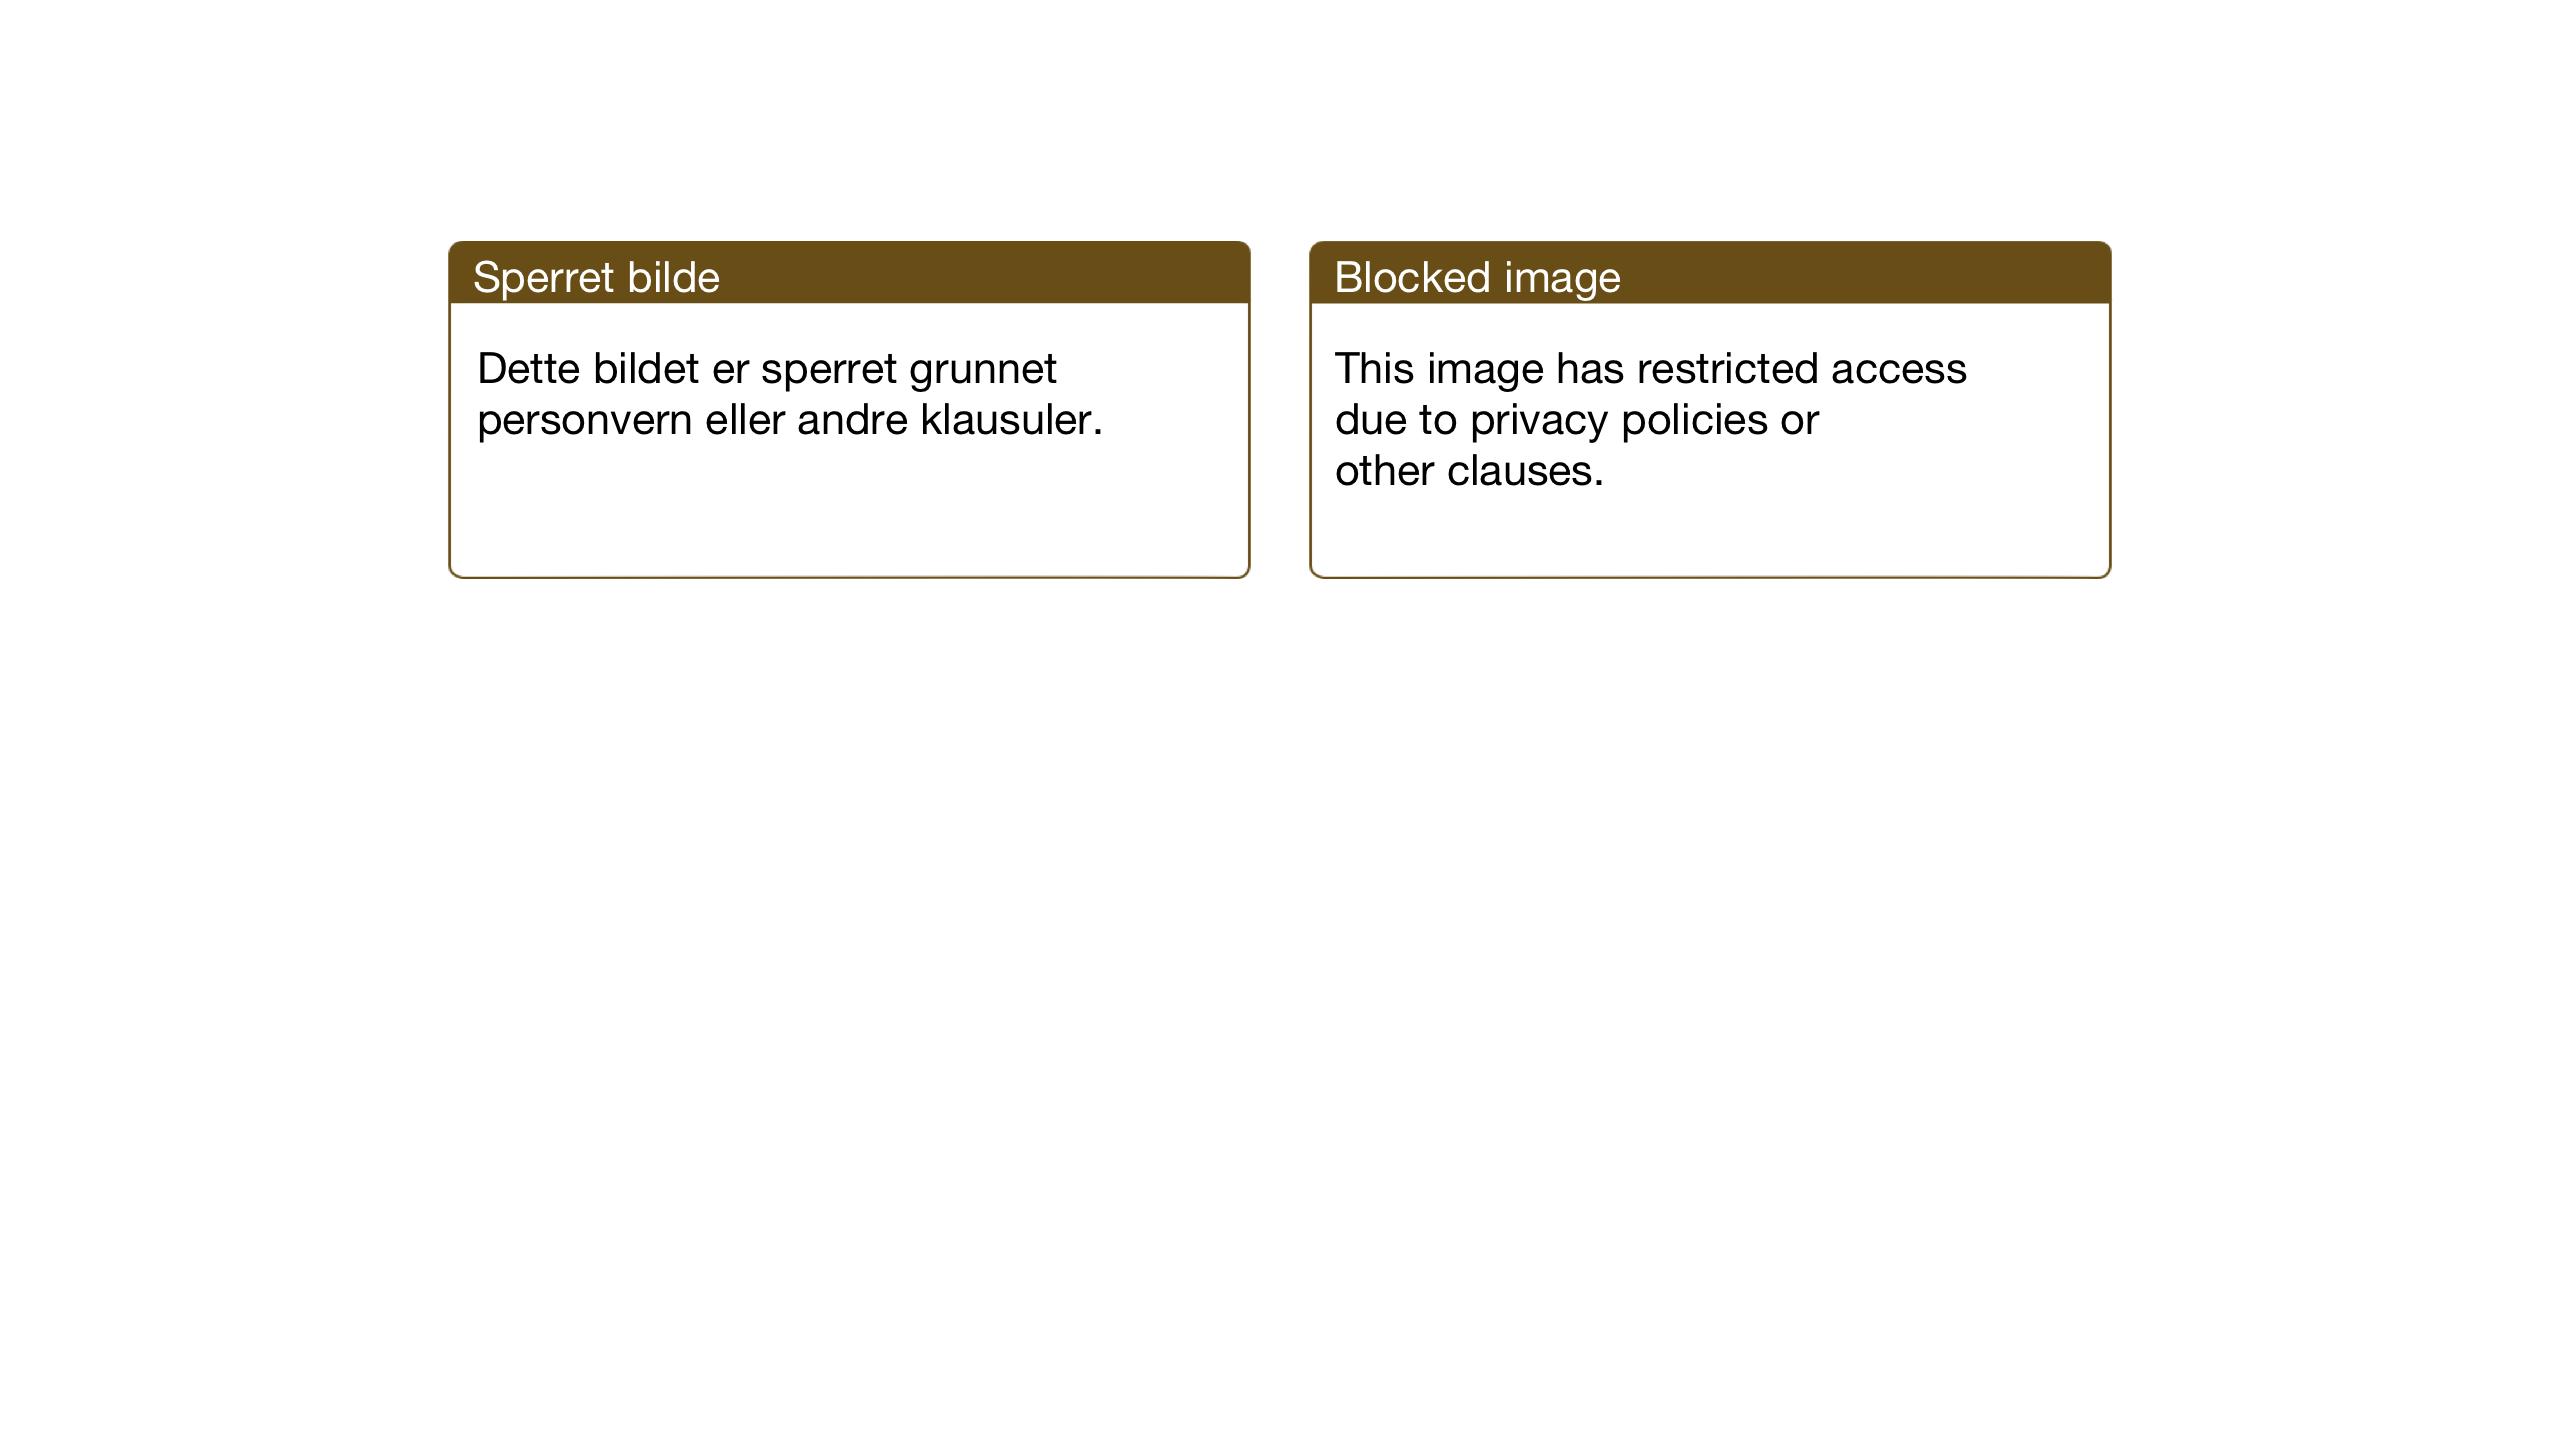 SAT, Ministerialprotokoller, klokkerbøker og fødselsregistre - Nordland, 847/L0680: Klokkerbok nr. 847C08, 1930-1947, s. 32